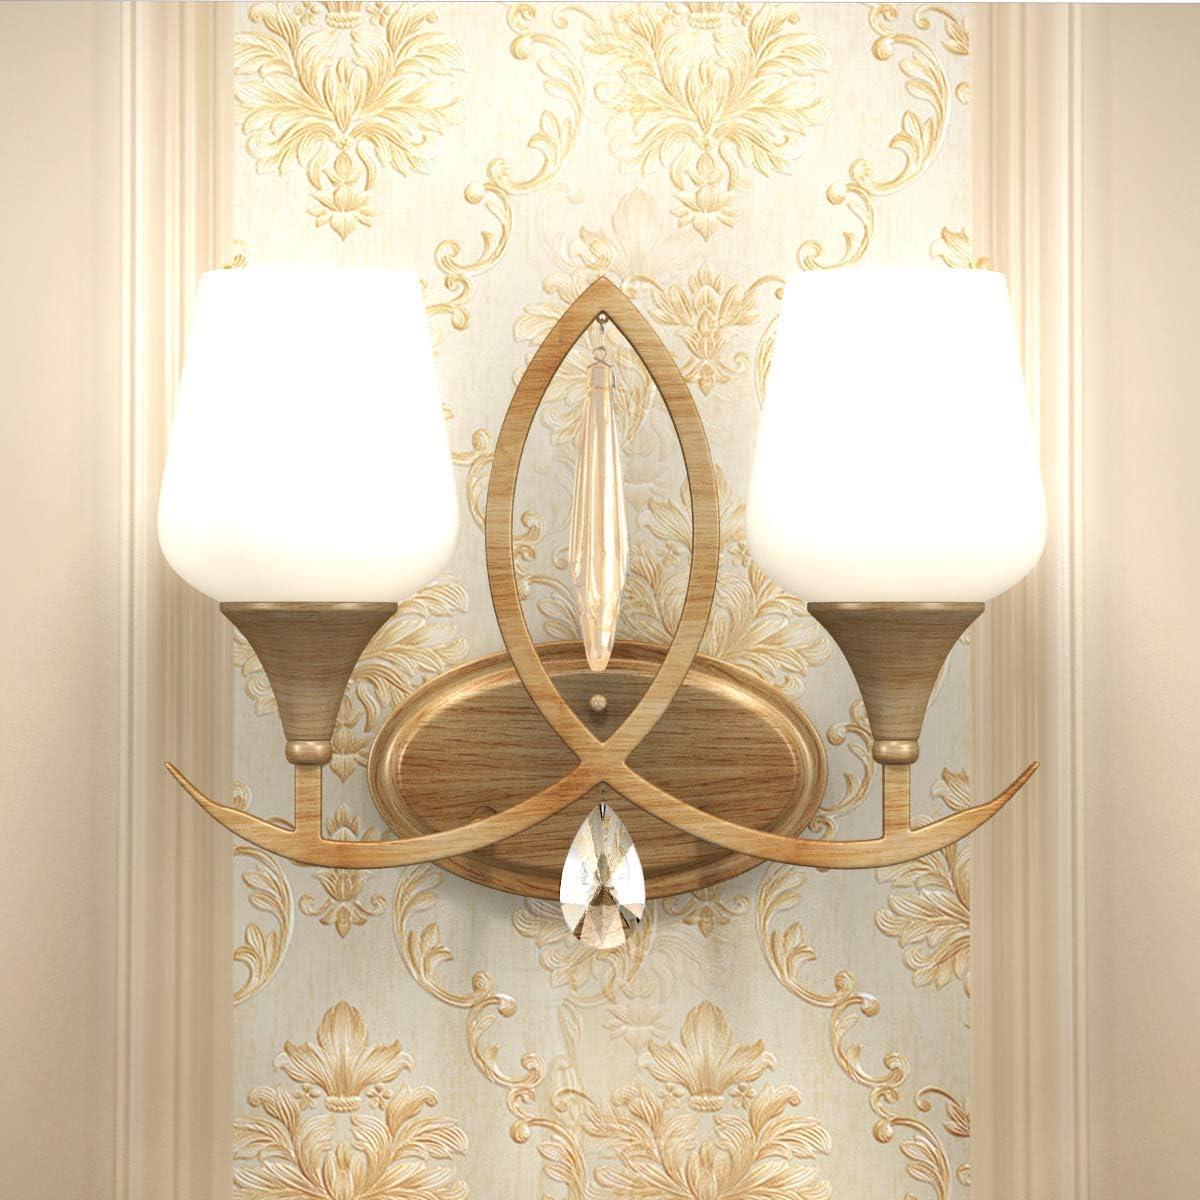 Tangkula 2-Light Wall Sconce Home Bathroom Bedroom Vanity Lamp Wall Mounted Lighting Fixtures Glass Shade Wall Lamp UL E26